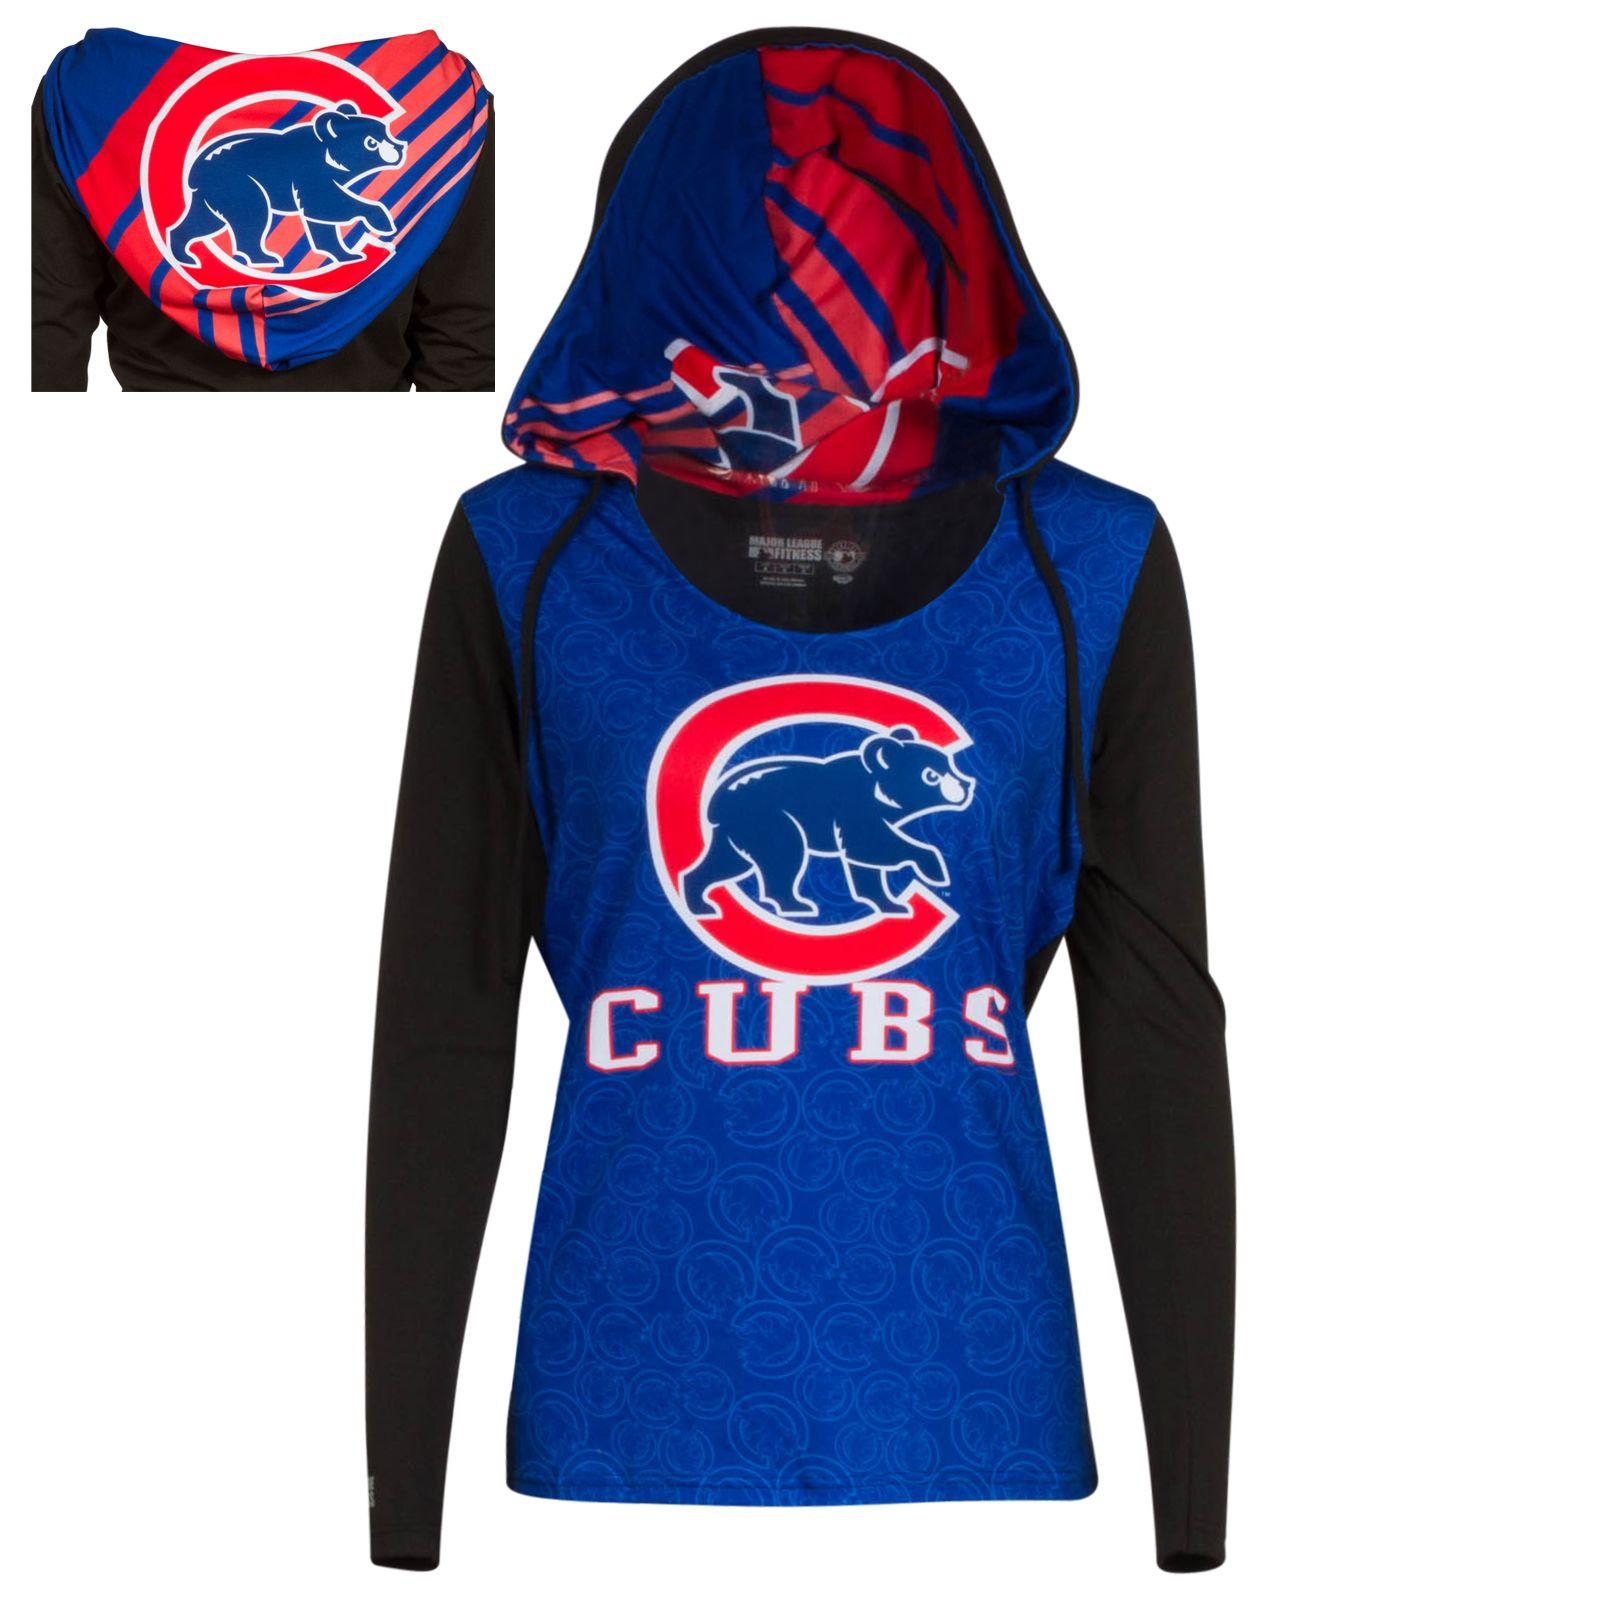 Cuwhs00063 Chicago Cubs Womens Cubs Clothes Sports Attire [ 1600 x 1600 Pixel ]